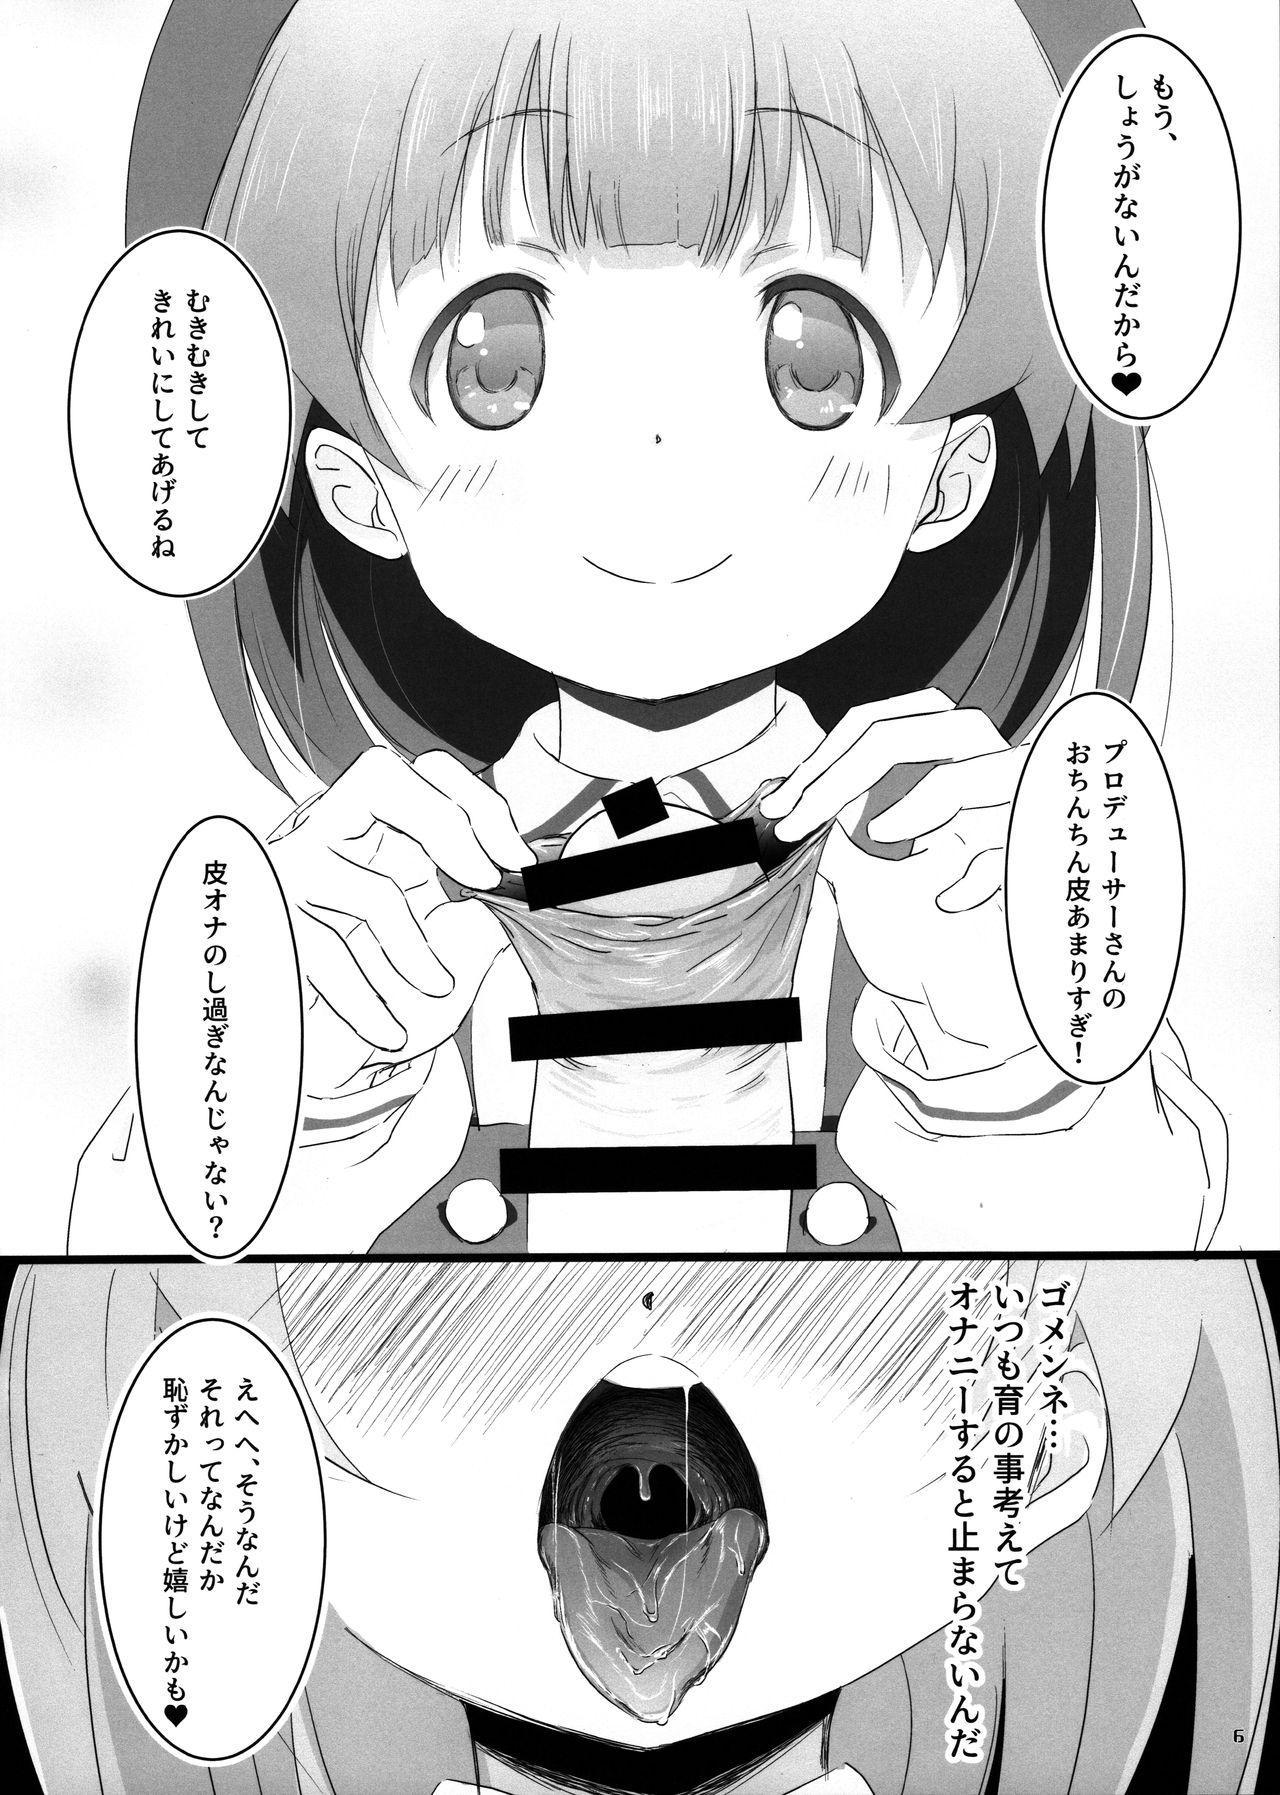 Beautiful Harmony + C96 Kaijou Gentei Omakebon Sailor Mizugi 4